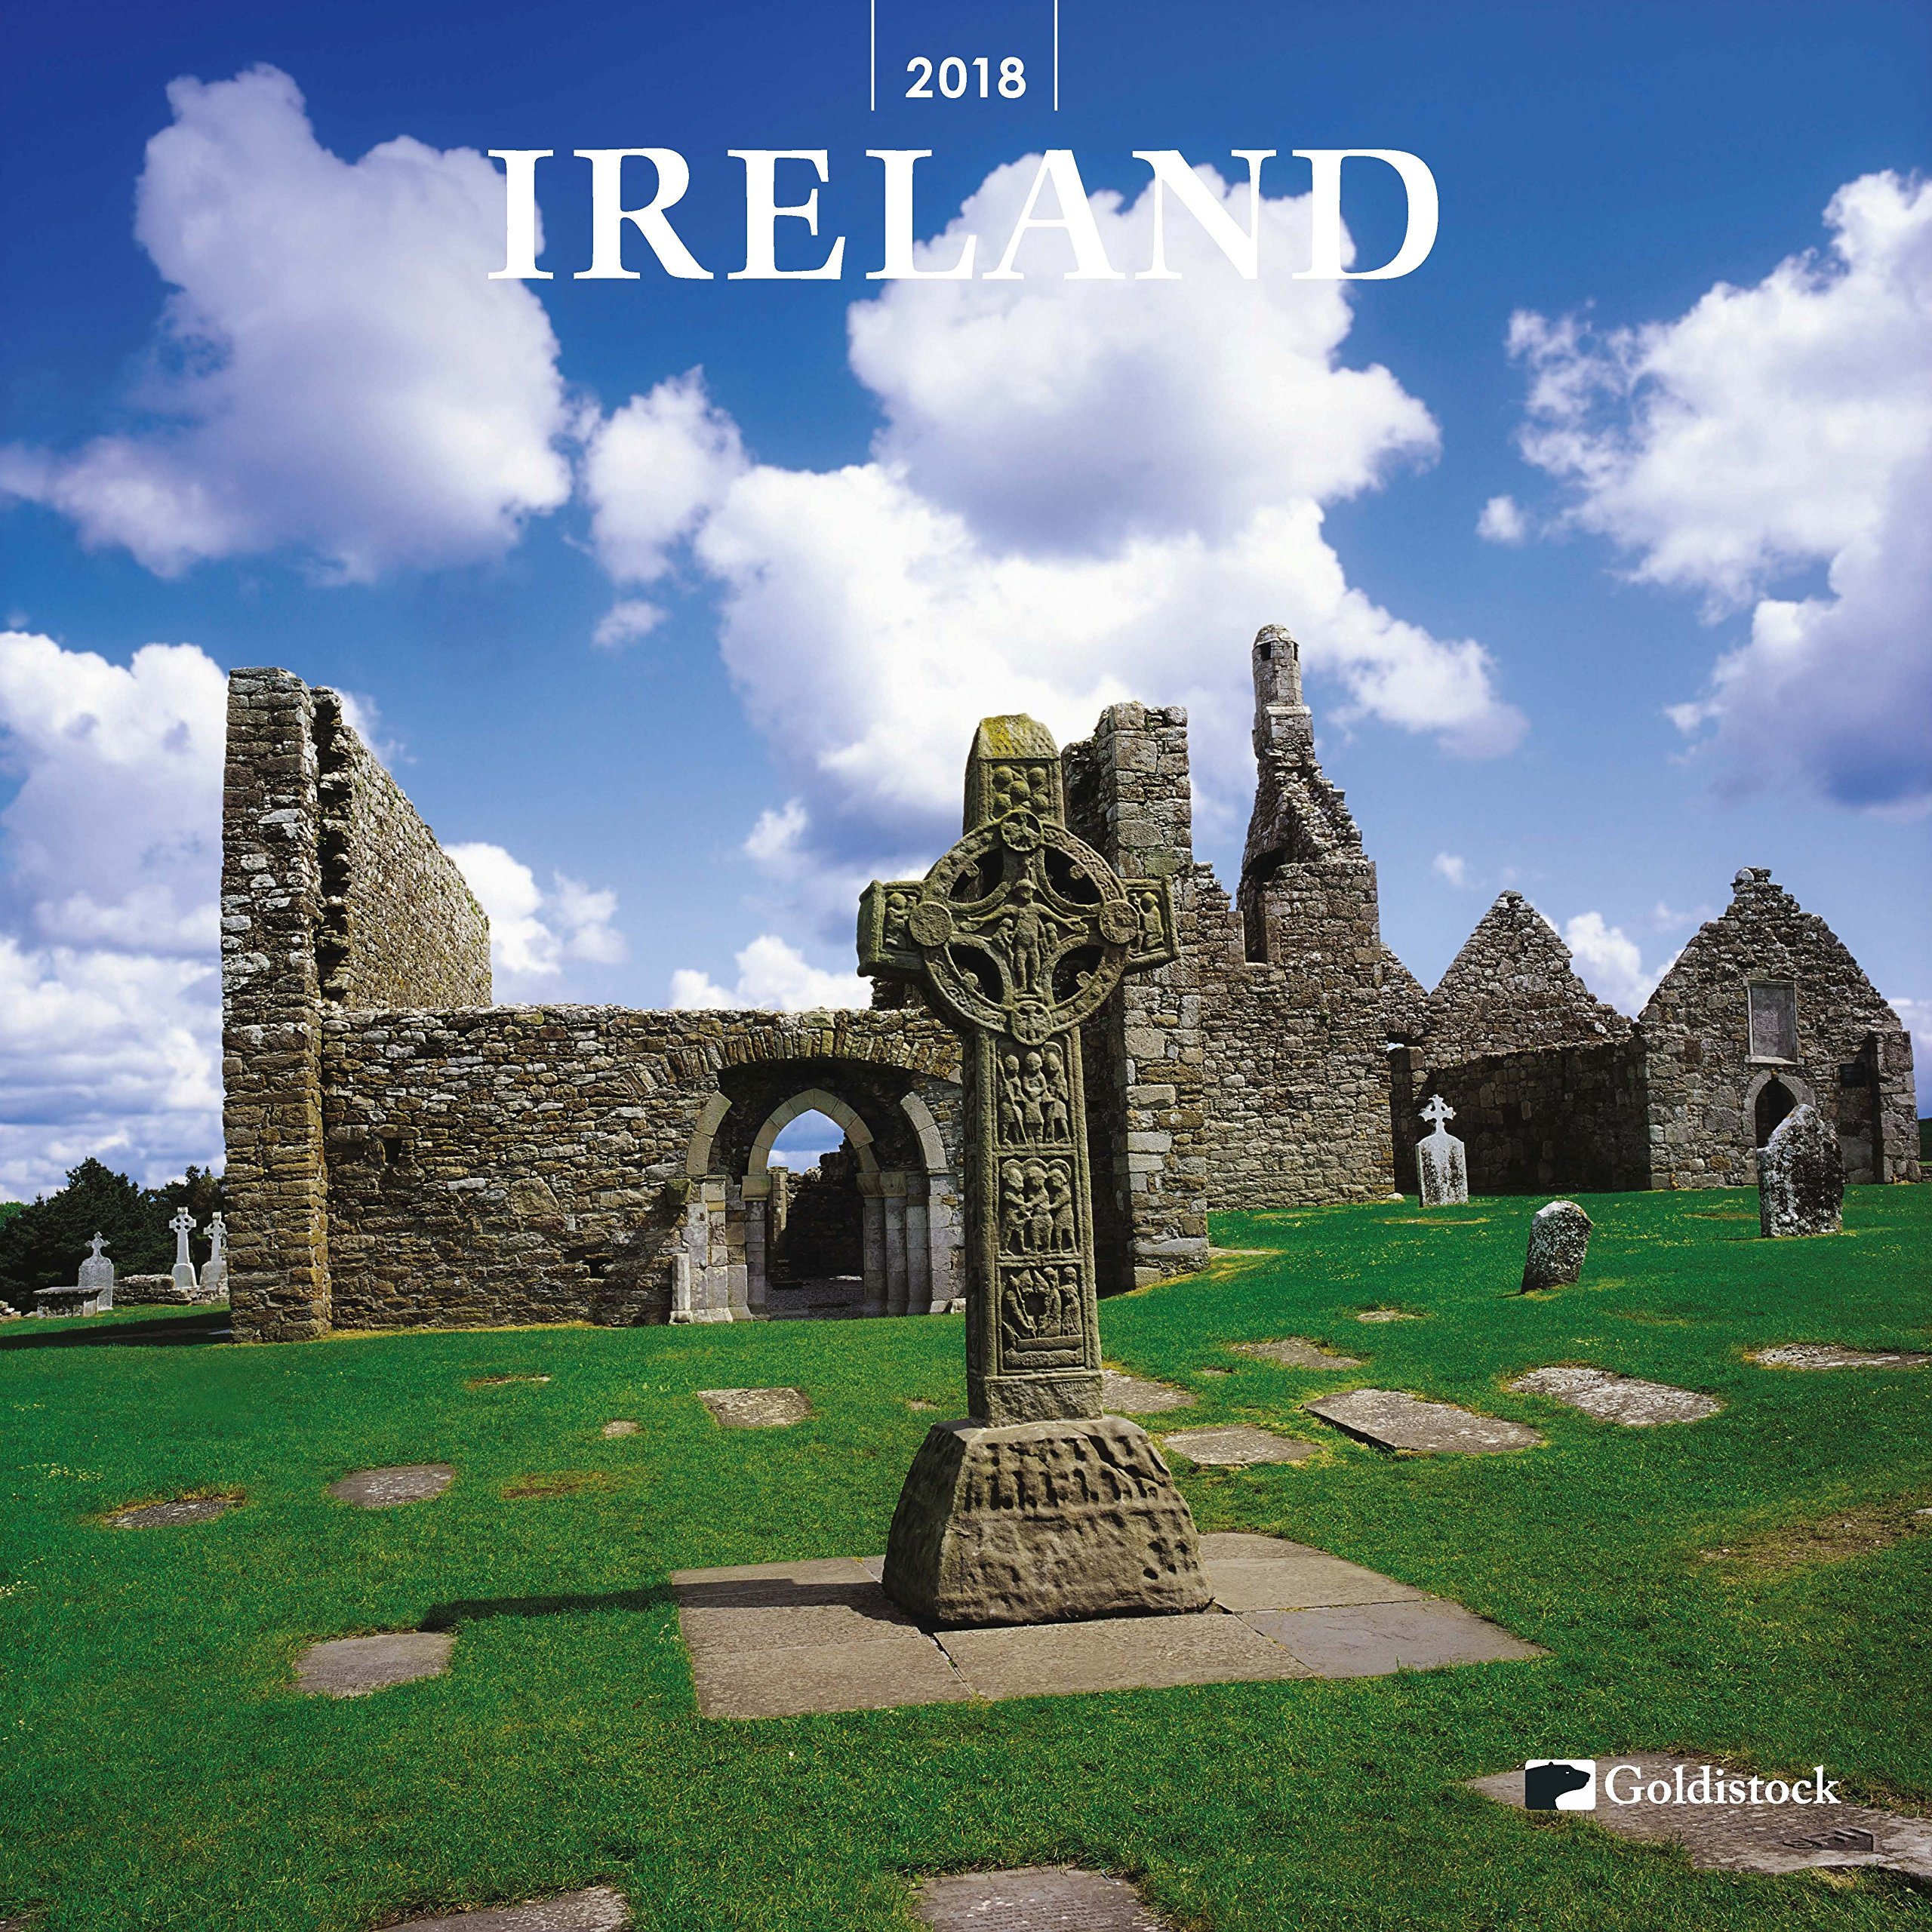 Goldistock -''Ireland'' 2018 Large Wall Calendar - 12'' x 24'' (Open) - Thick & Sturdy Paper - Beautiful Images of Historic Ireland